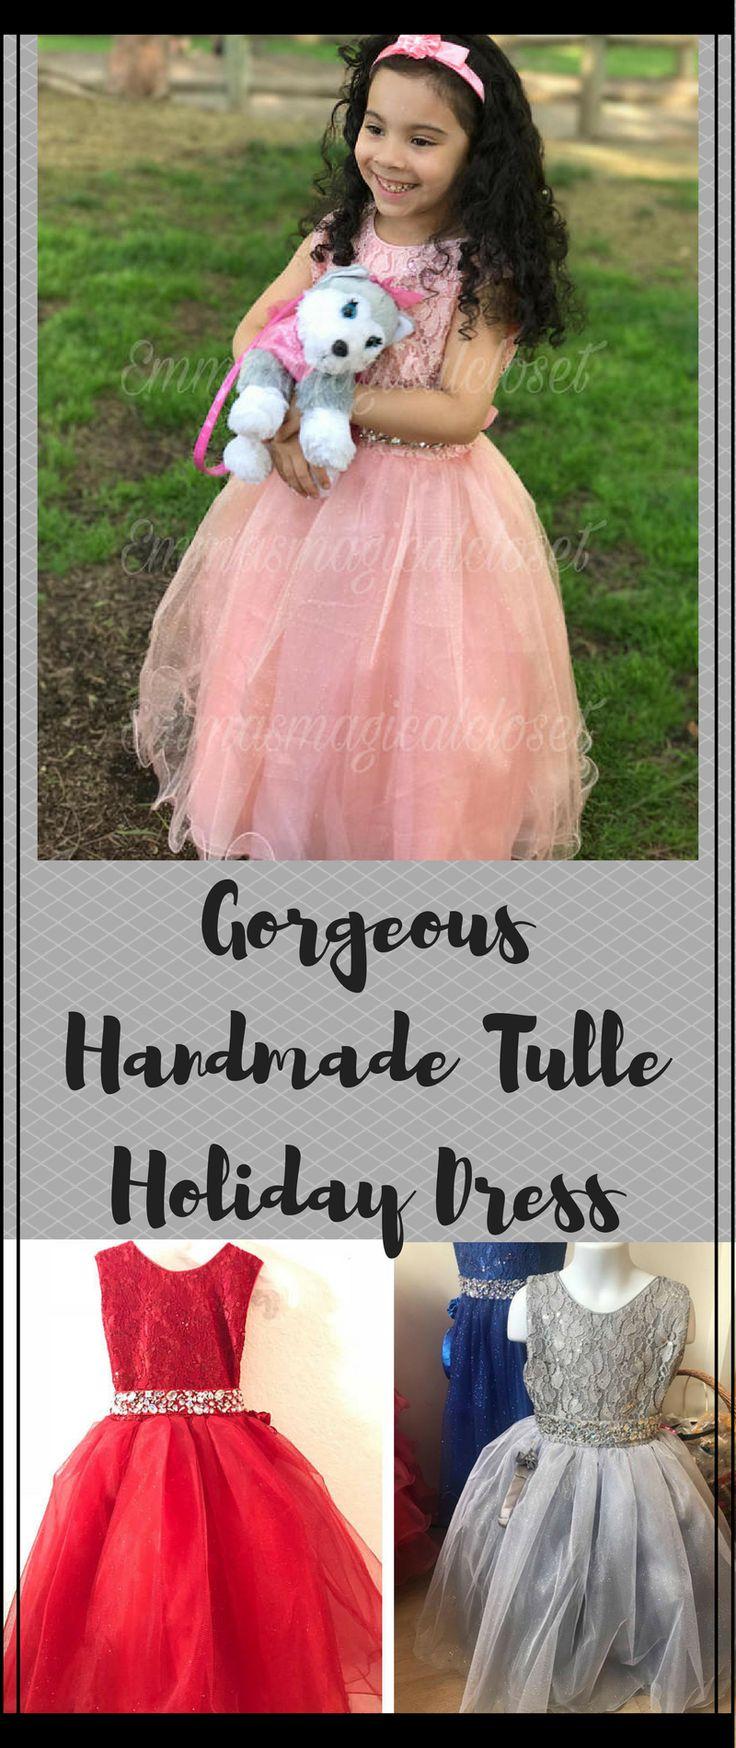 87 best Holiday Dresses for Girls images on Pinterest | Vestidos ...